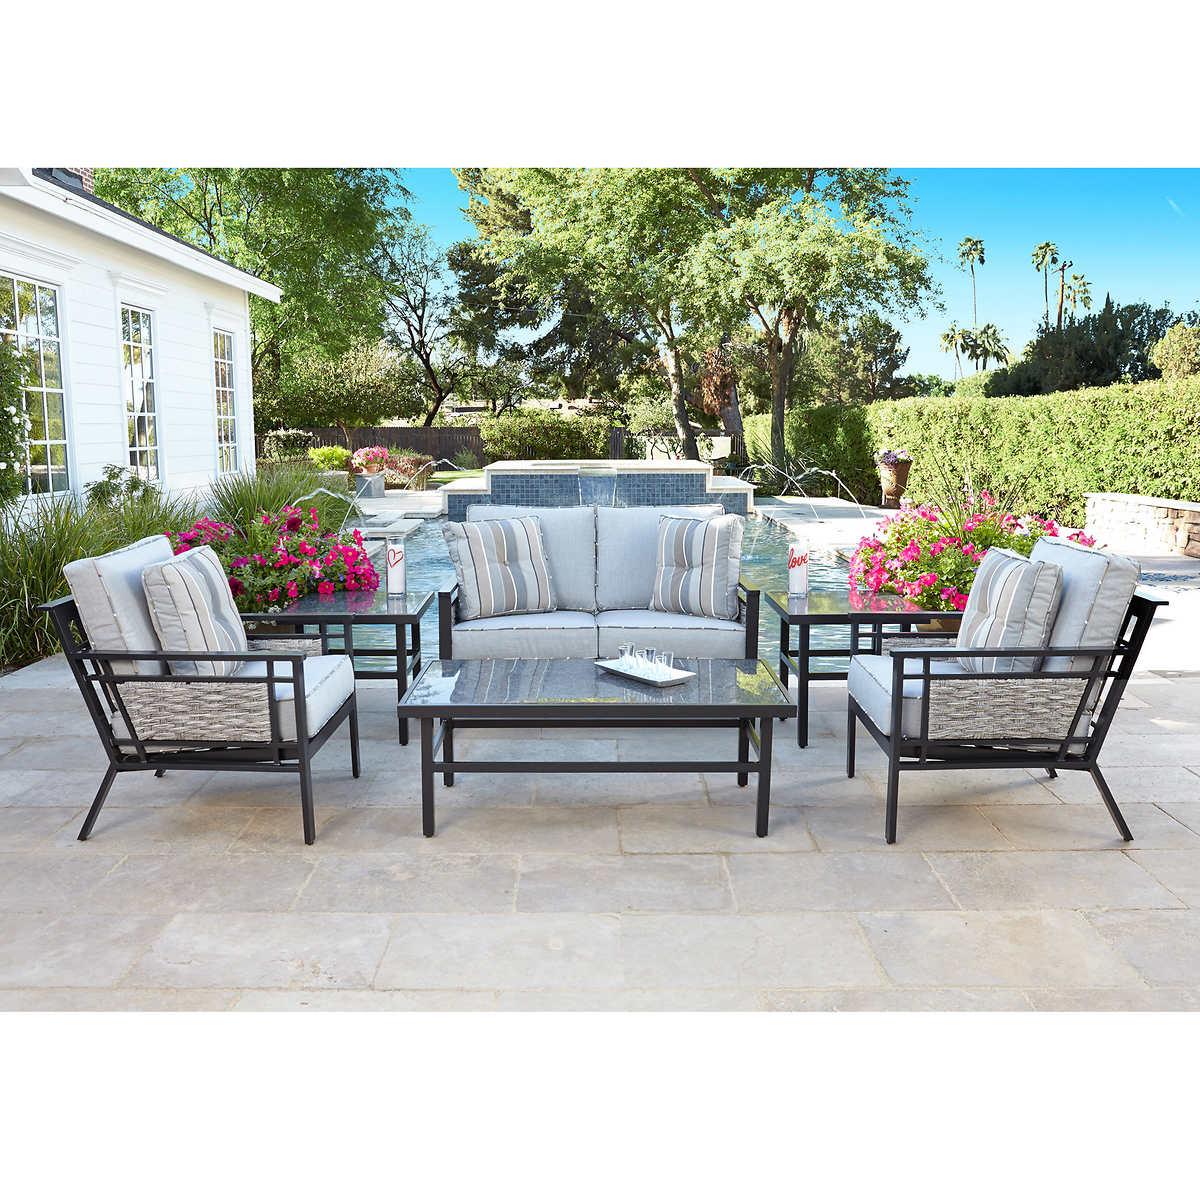 100 Patio Furniture Tucson Az D U0026 J Patio Furniture Patio Direct Replacement Slings